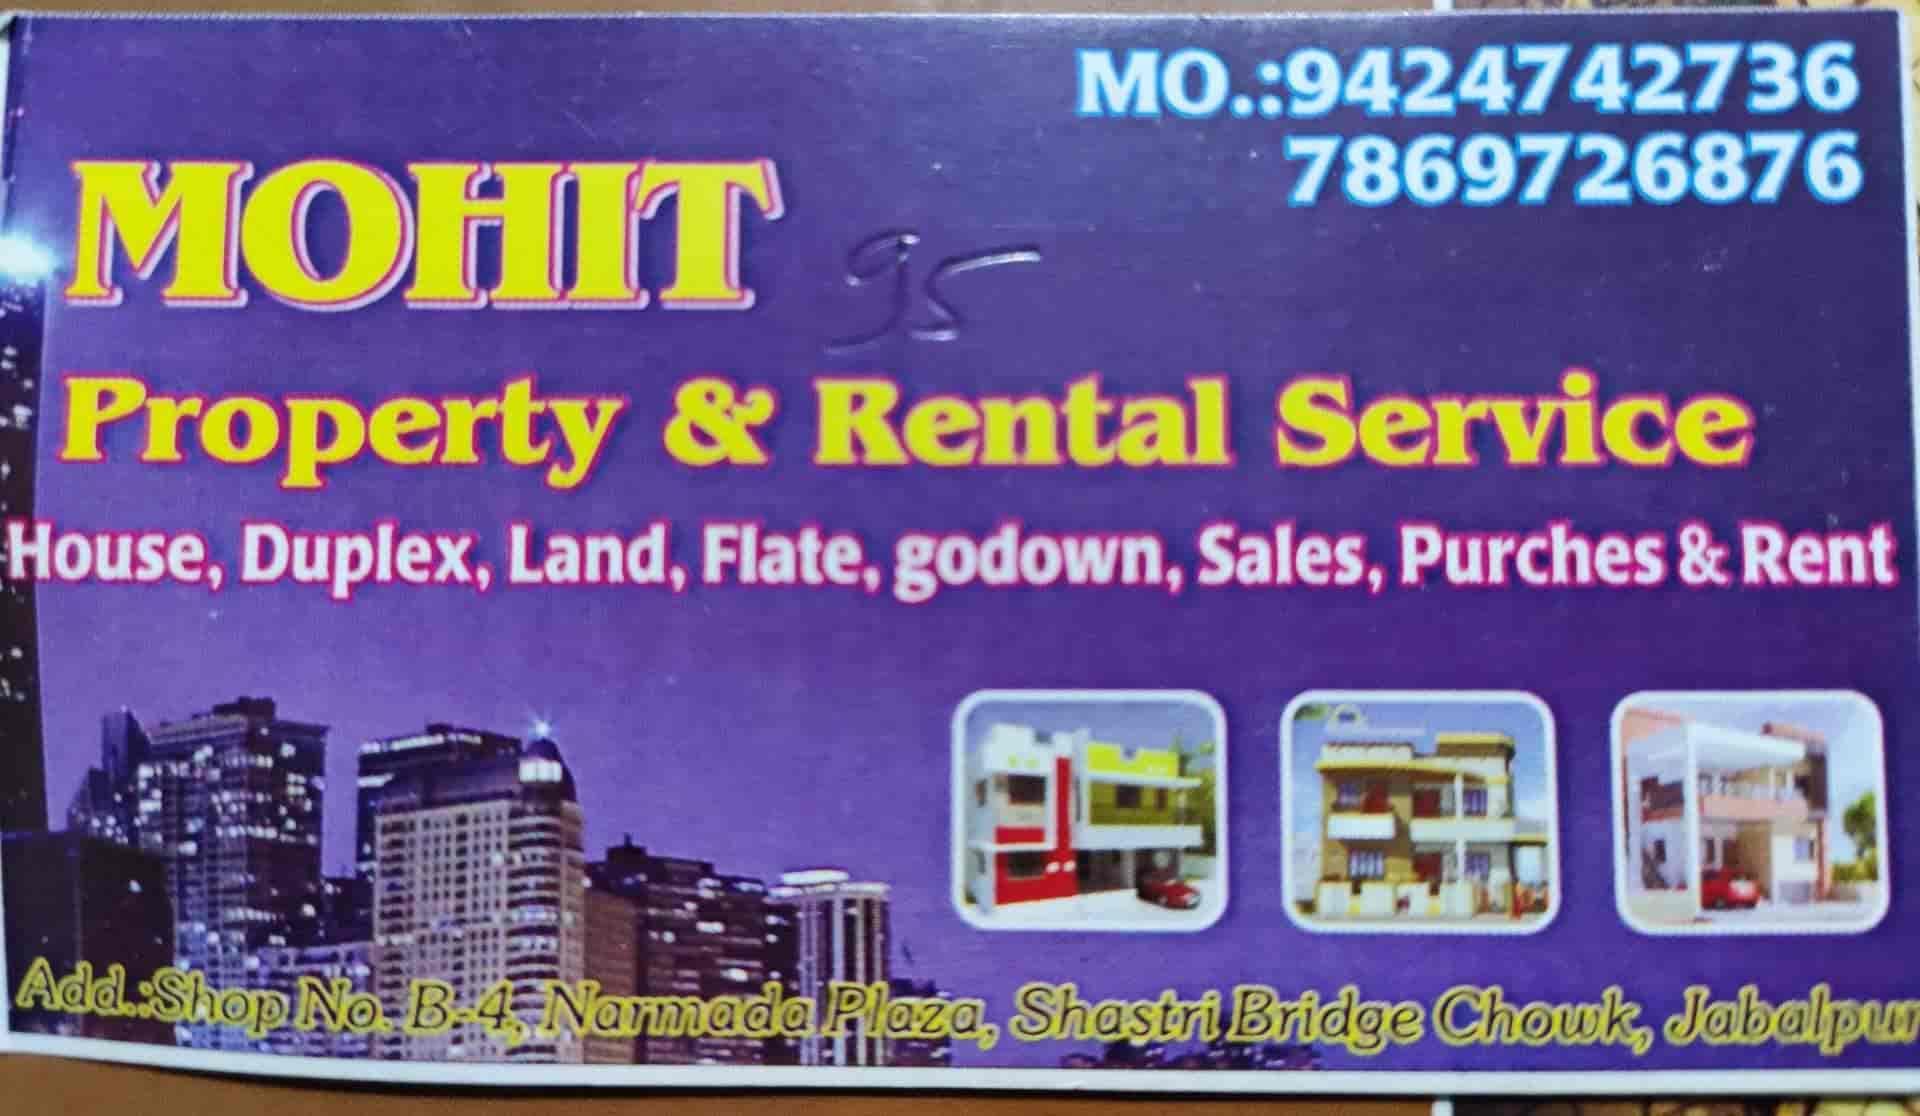 Mohit property & Rental service, Napier Town Jabalpur